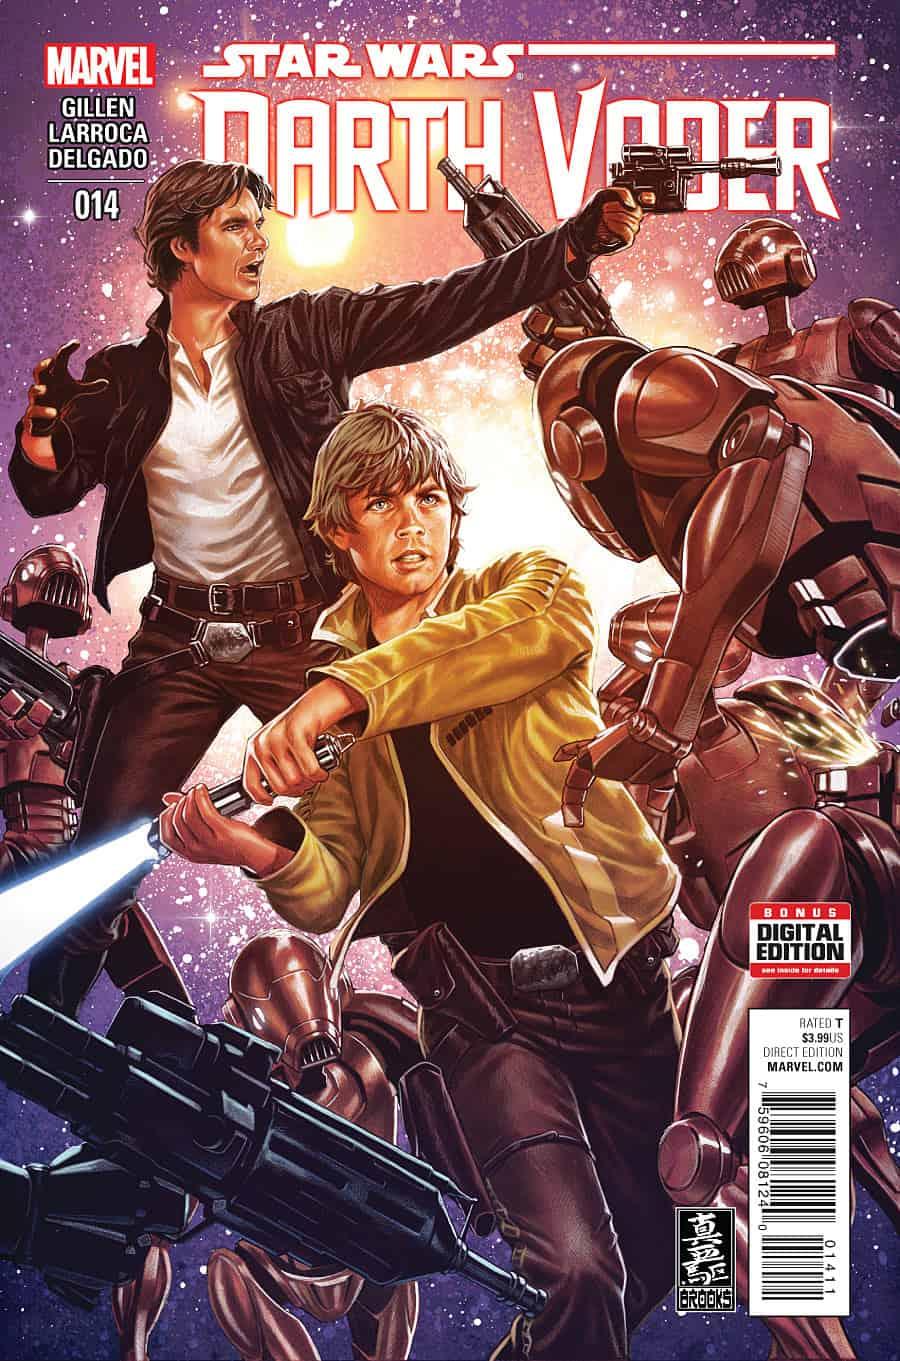 Darth Vader #14 - Cover